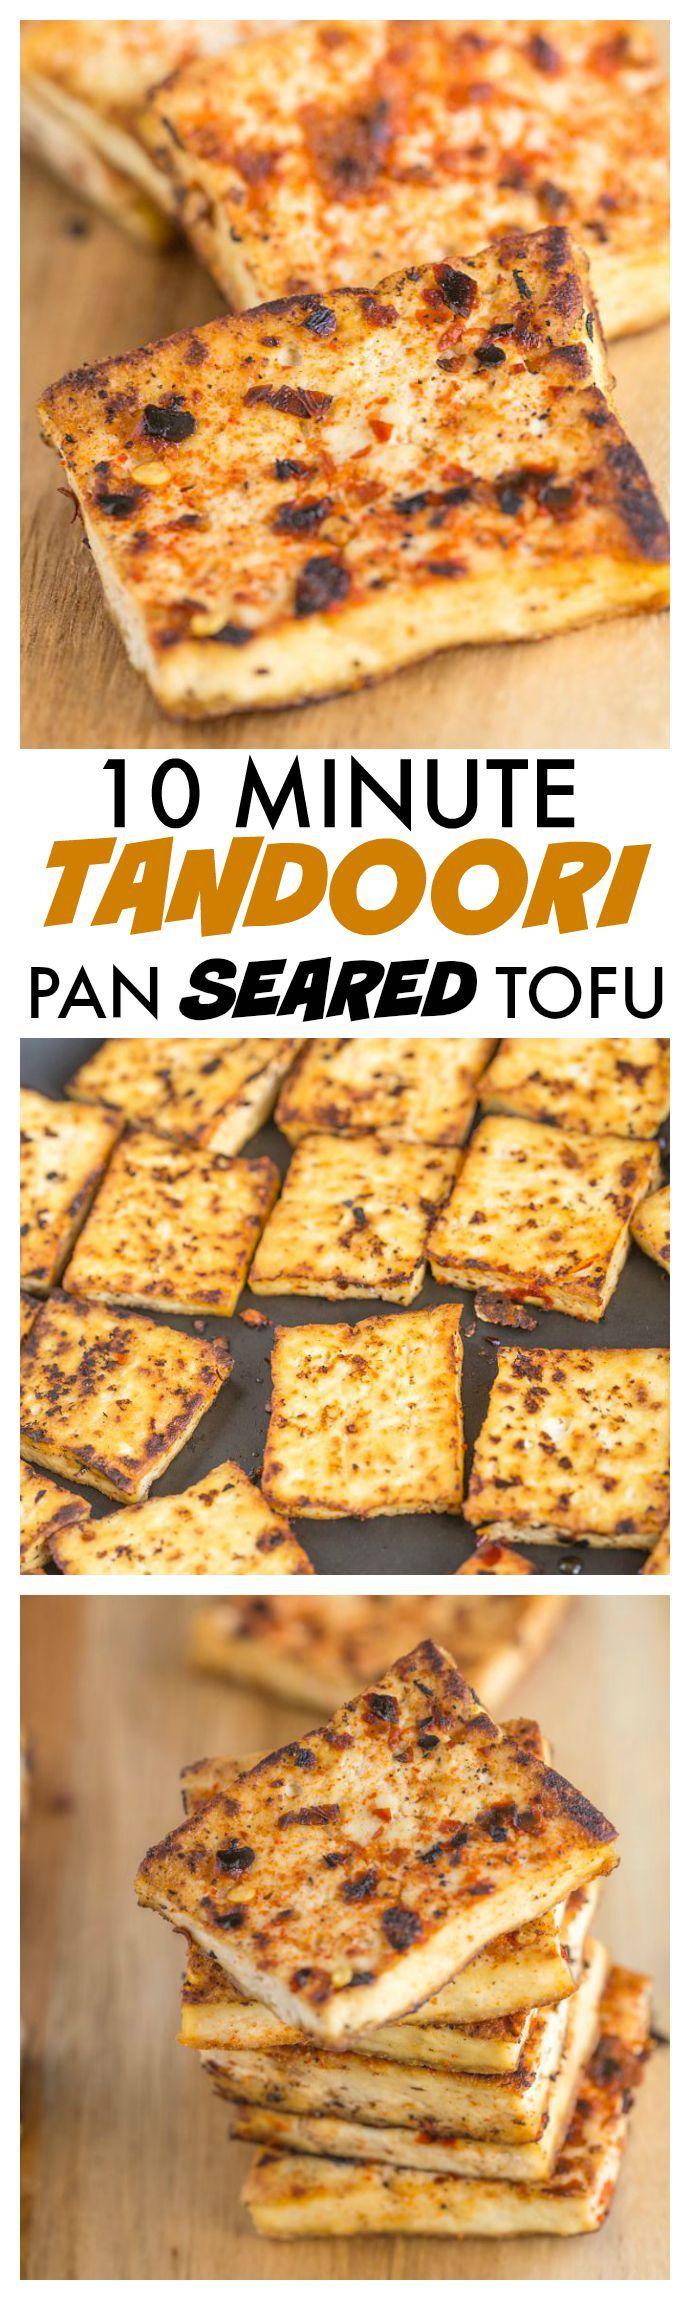 Vegan firm tofu recipes